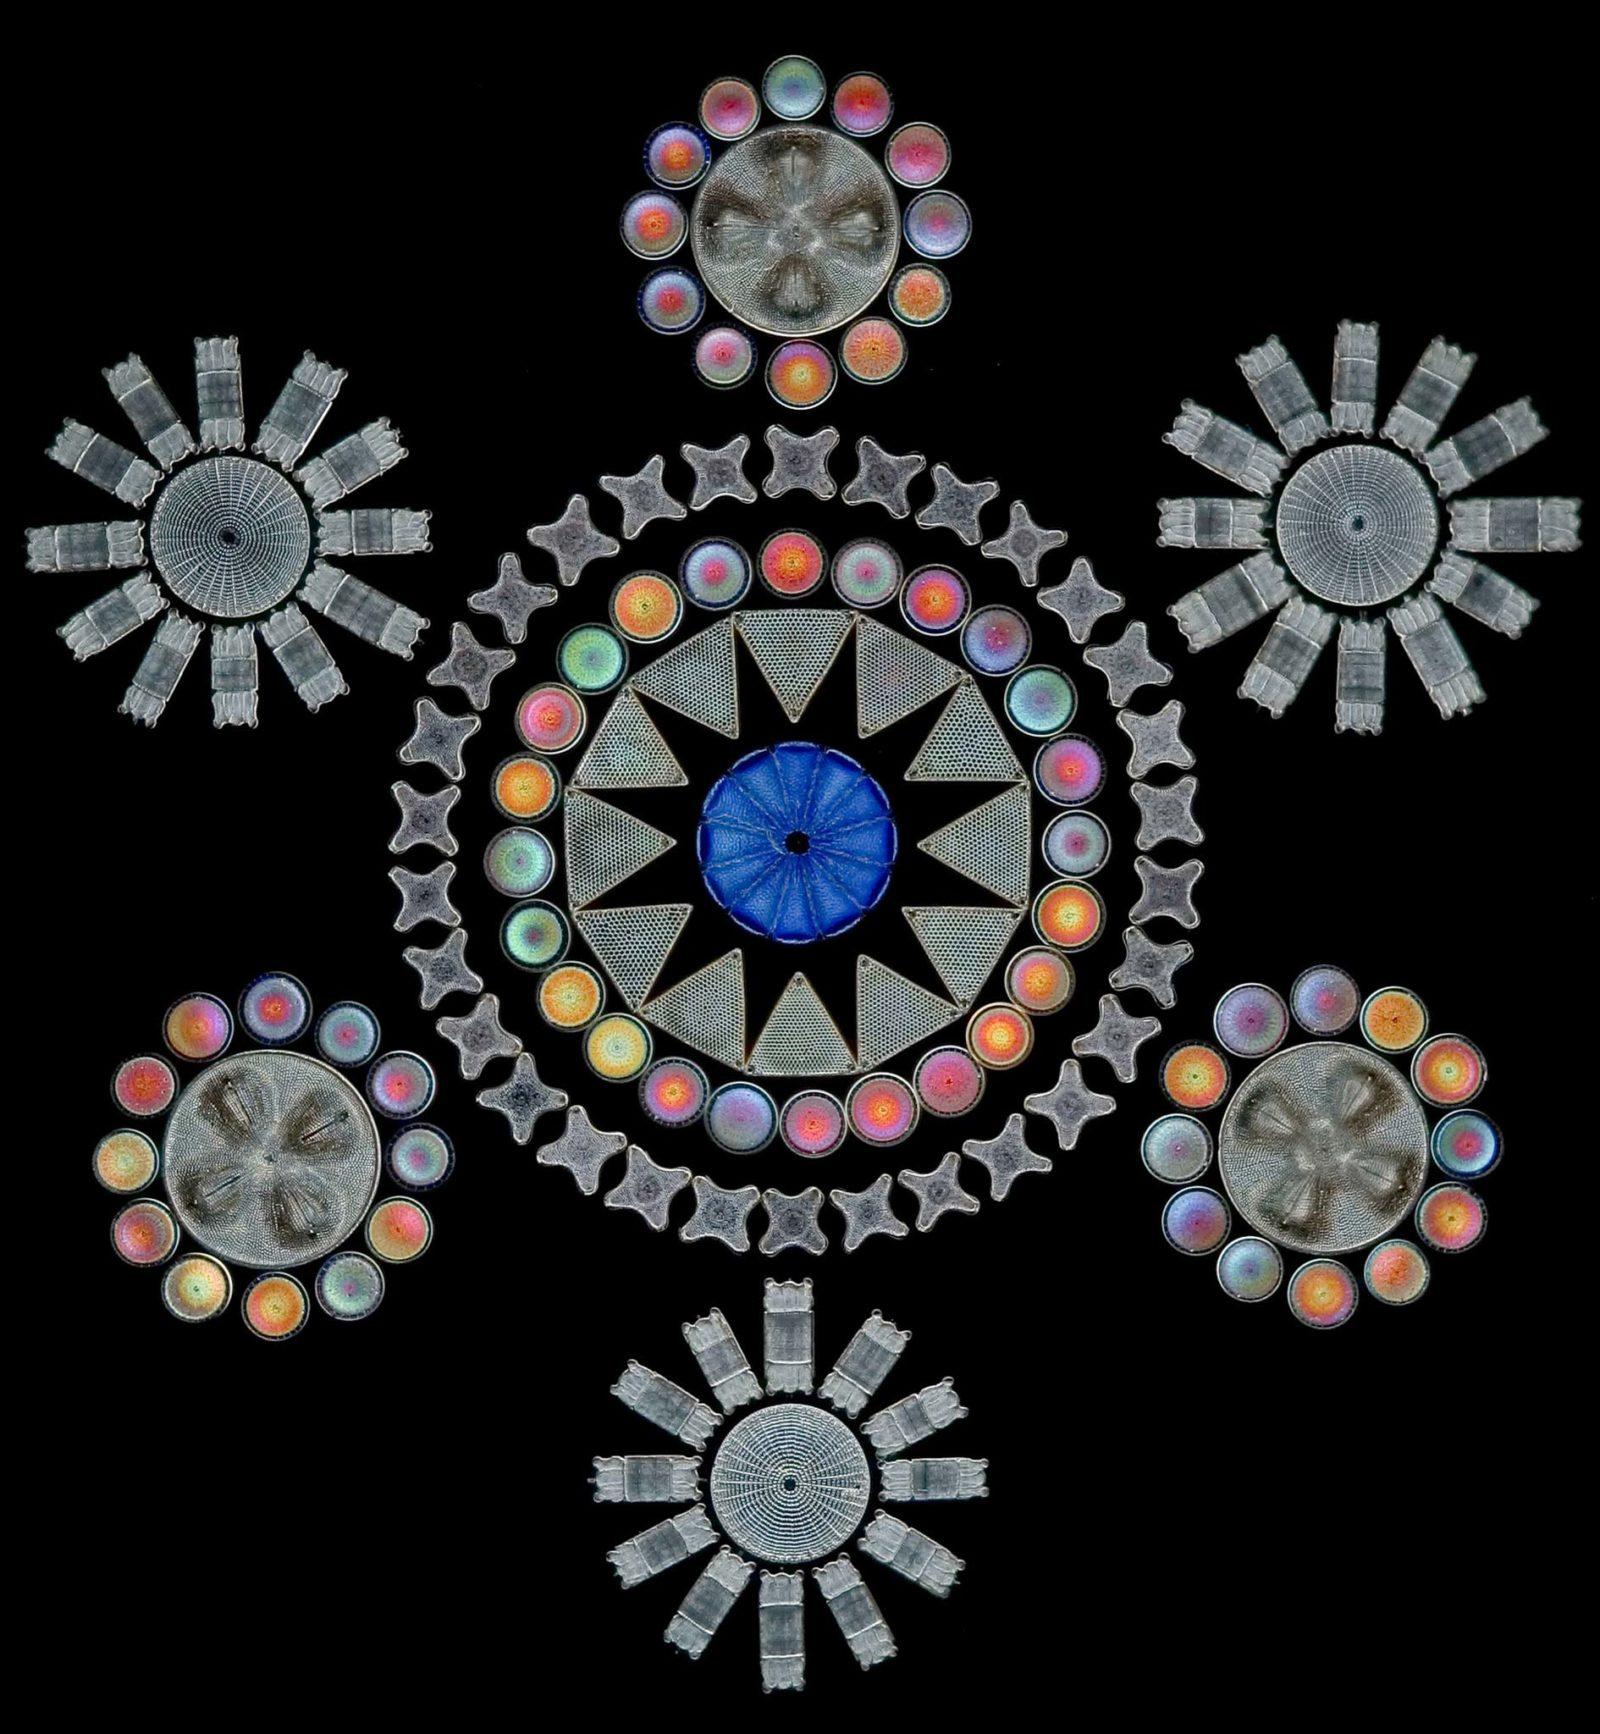 Work by German microscopist J.D. Möller